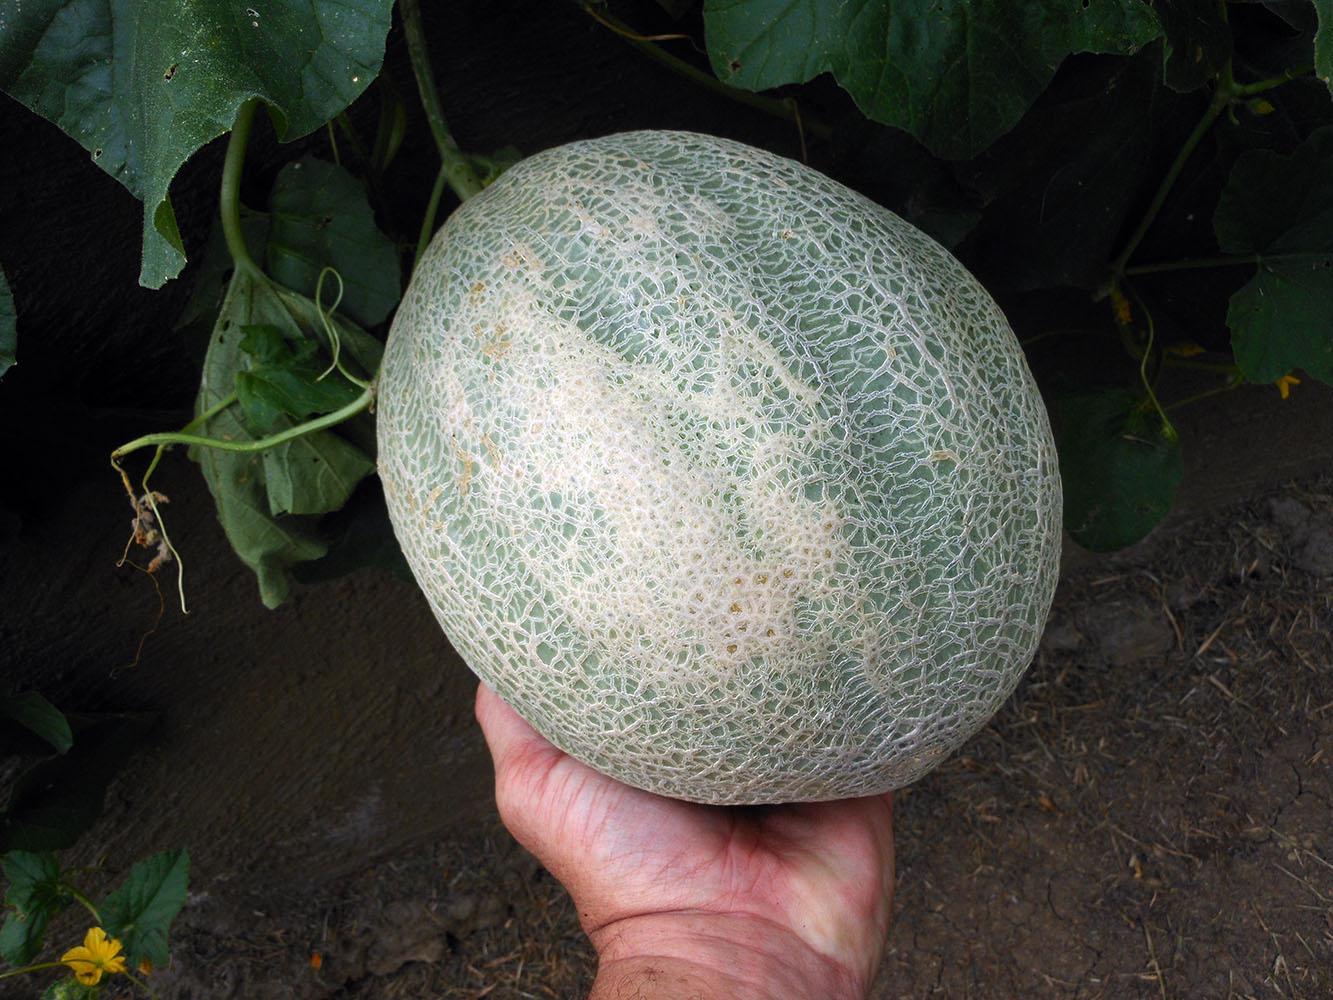 08-04-2016 Cantaloupe Plant 04